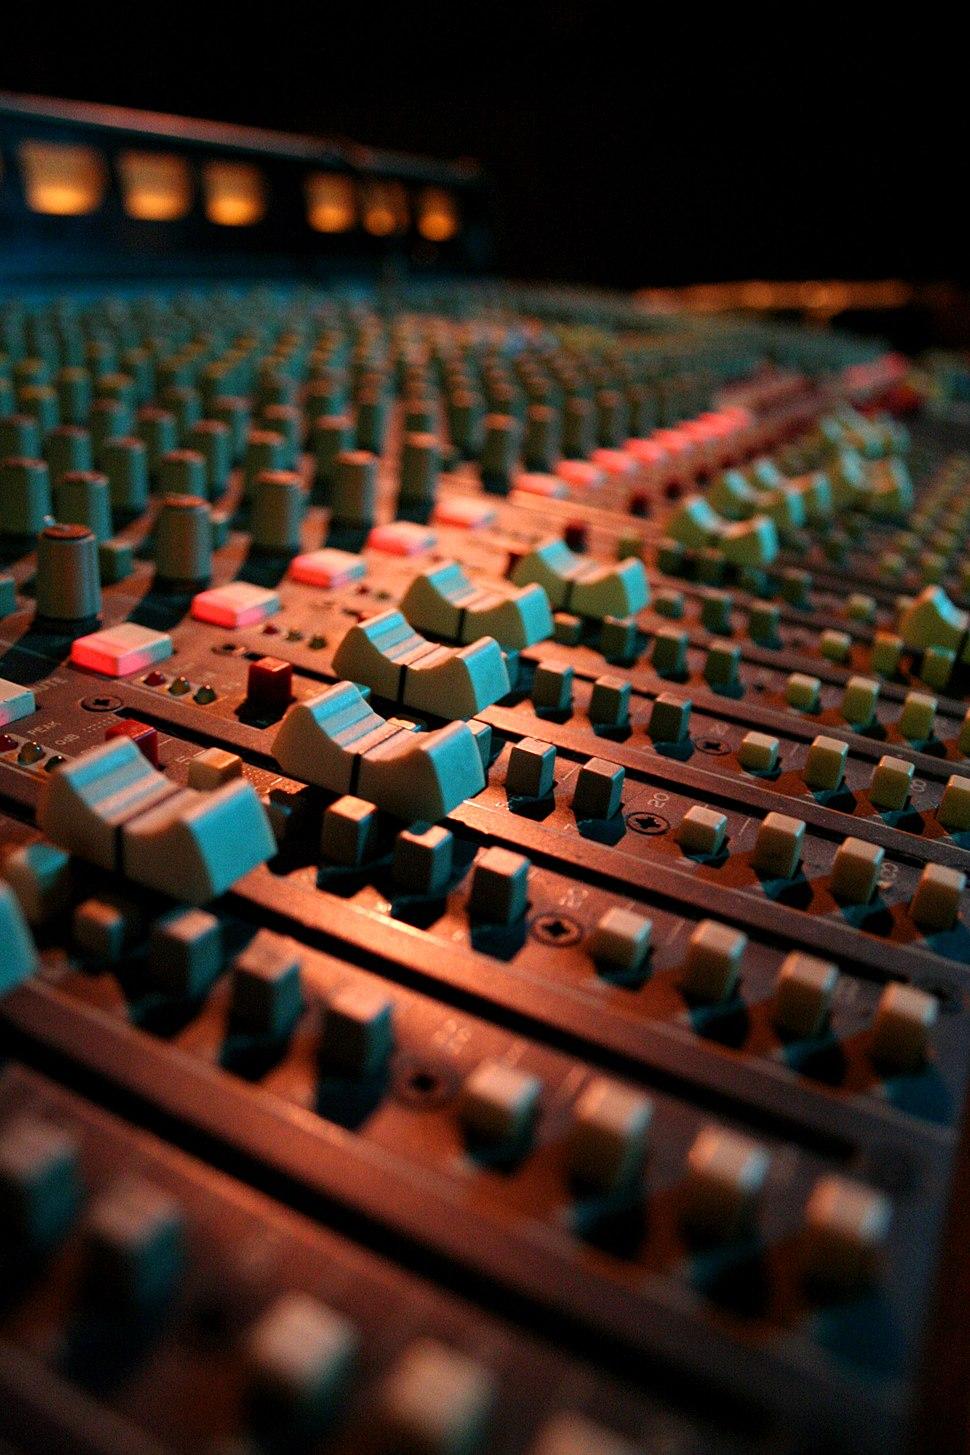 Audio mixer faders